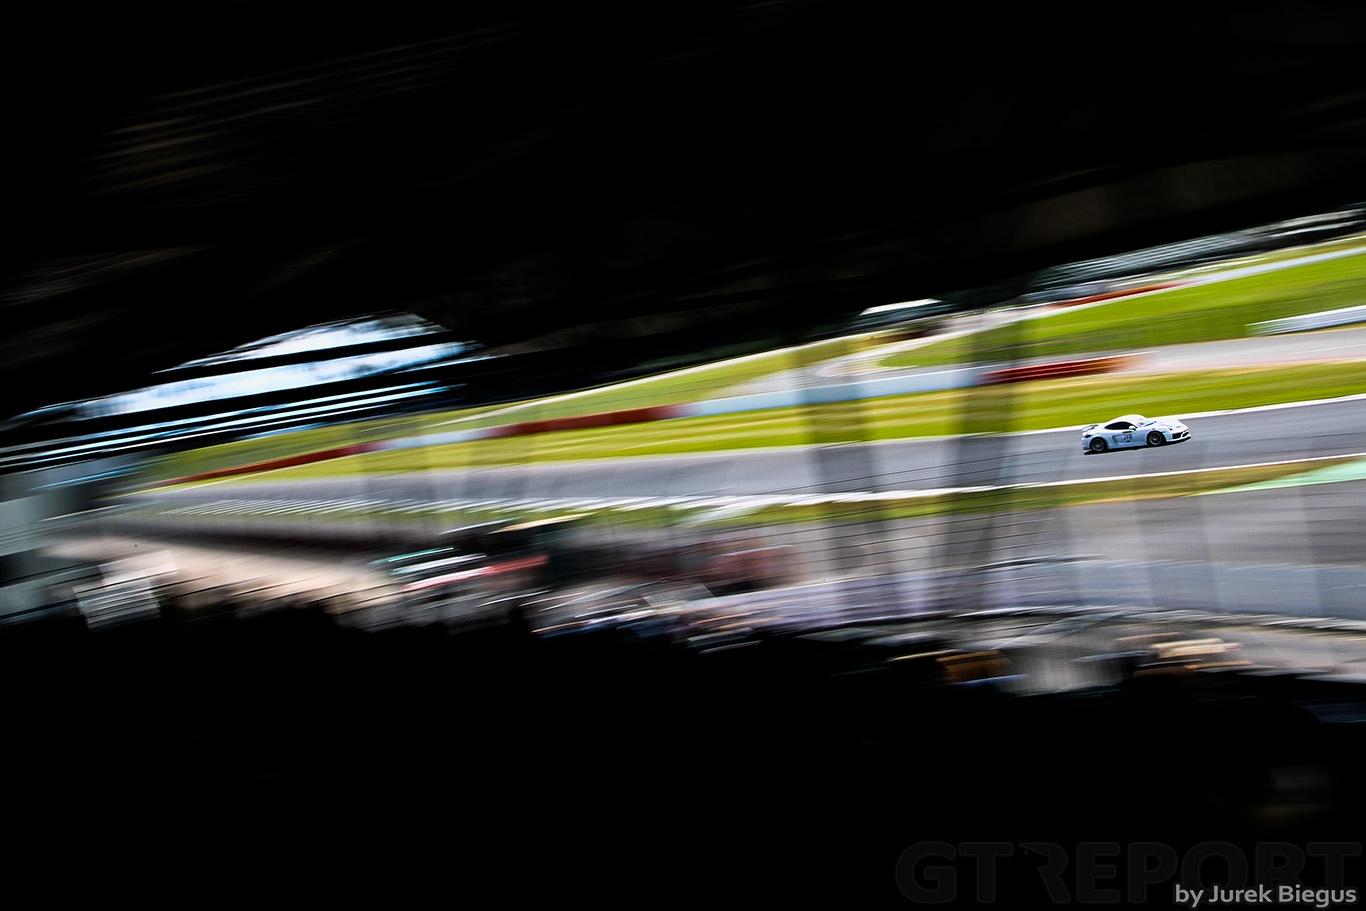 | Britcar Dunlop Endurance Championship, Silverstone. Photo: Jurek Biegus